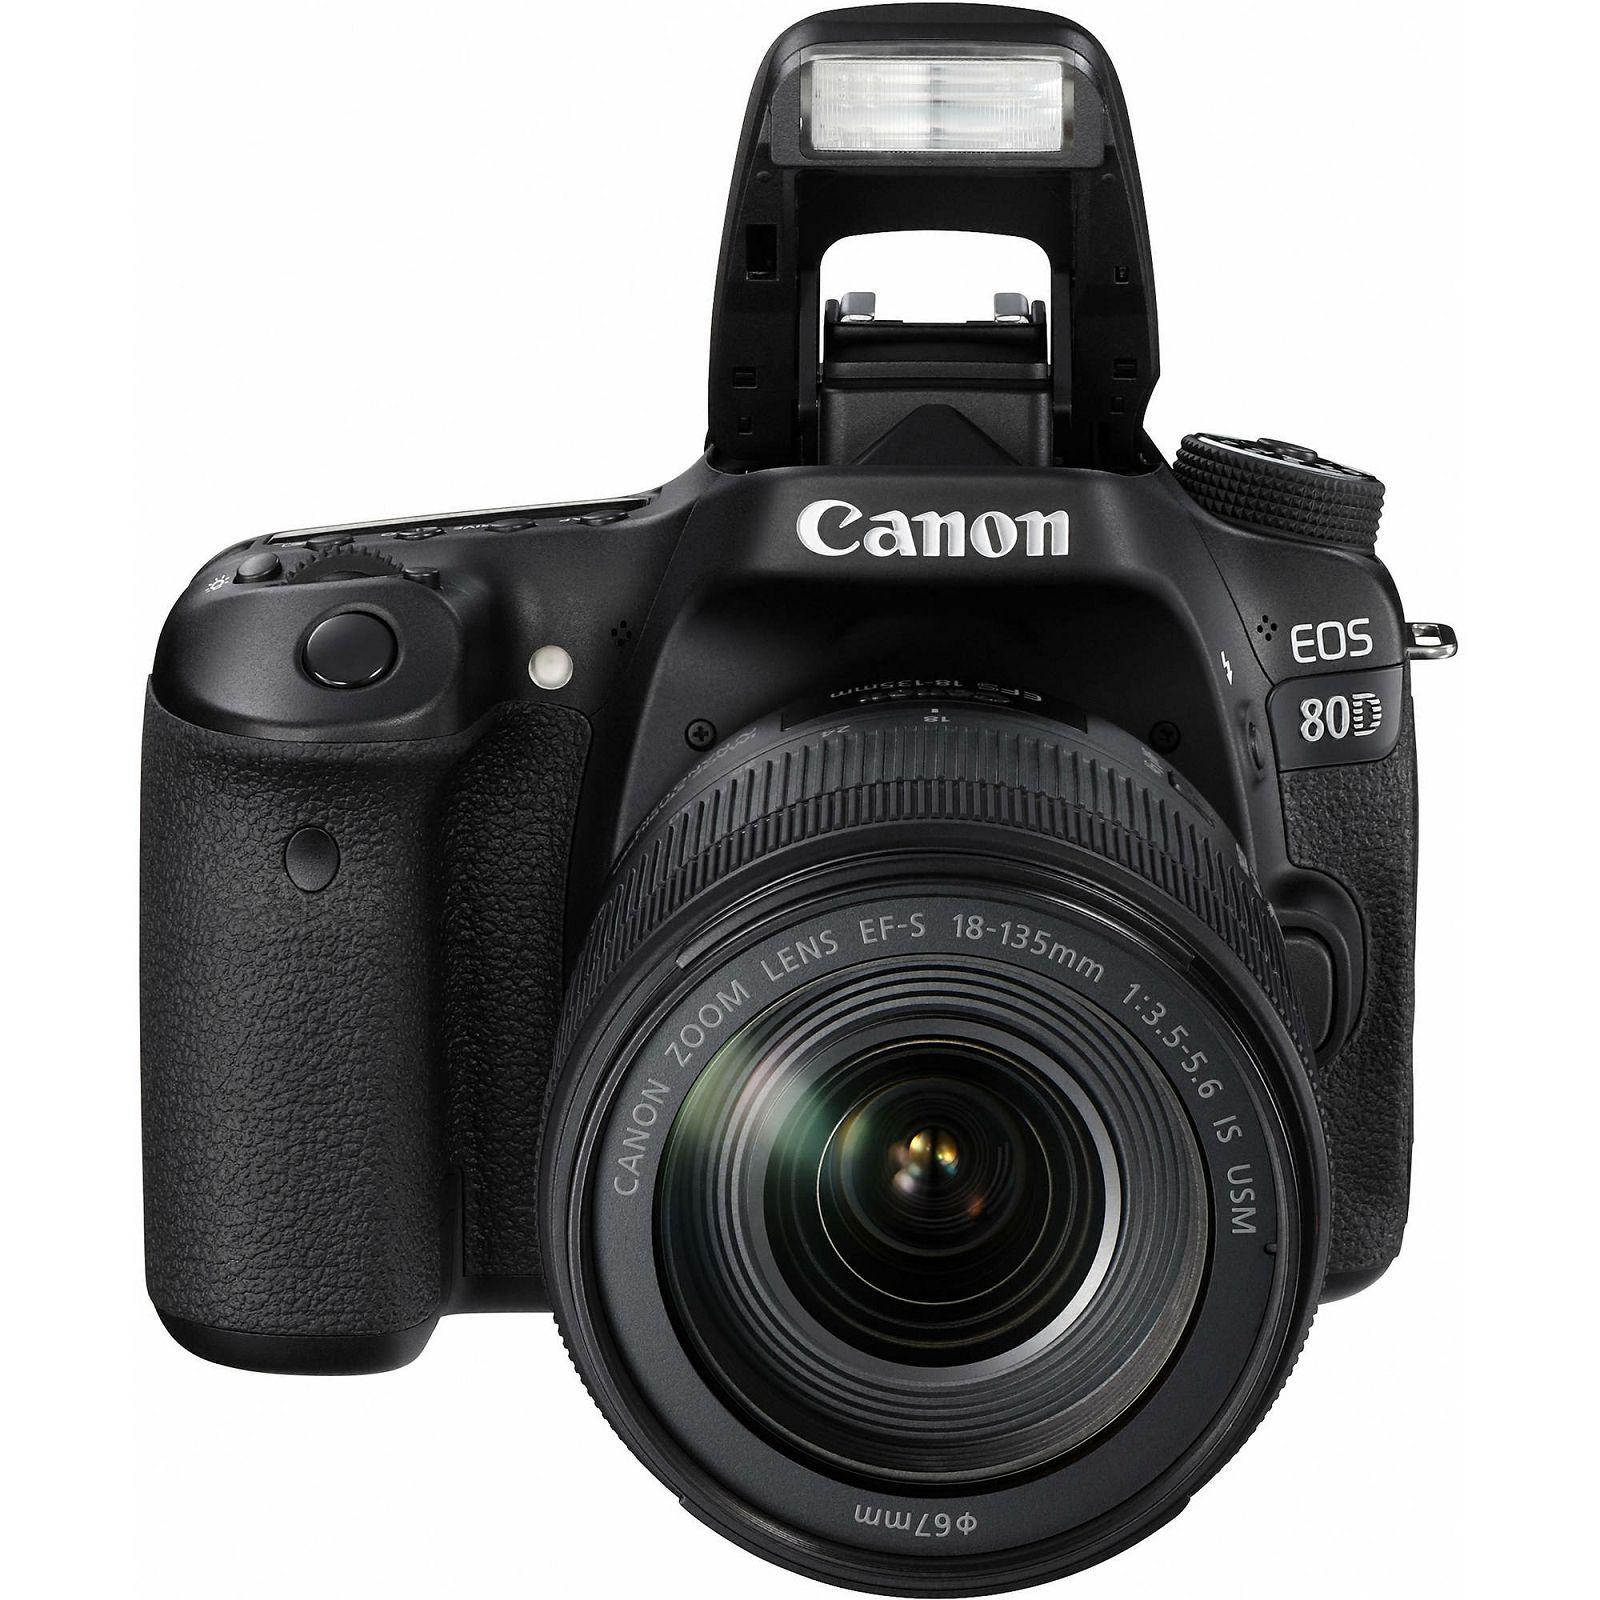 Canon Eos 80d 18 135 Is Usm Nano Dslr Digitalni Fotoaparat S 700d Kit 135mm F 35 56 Stm Objektivom